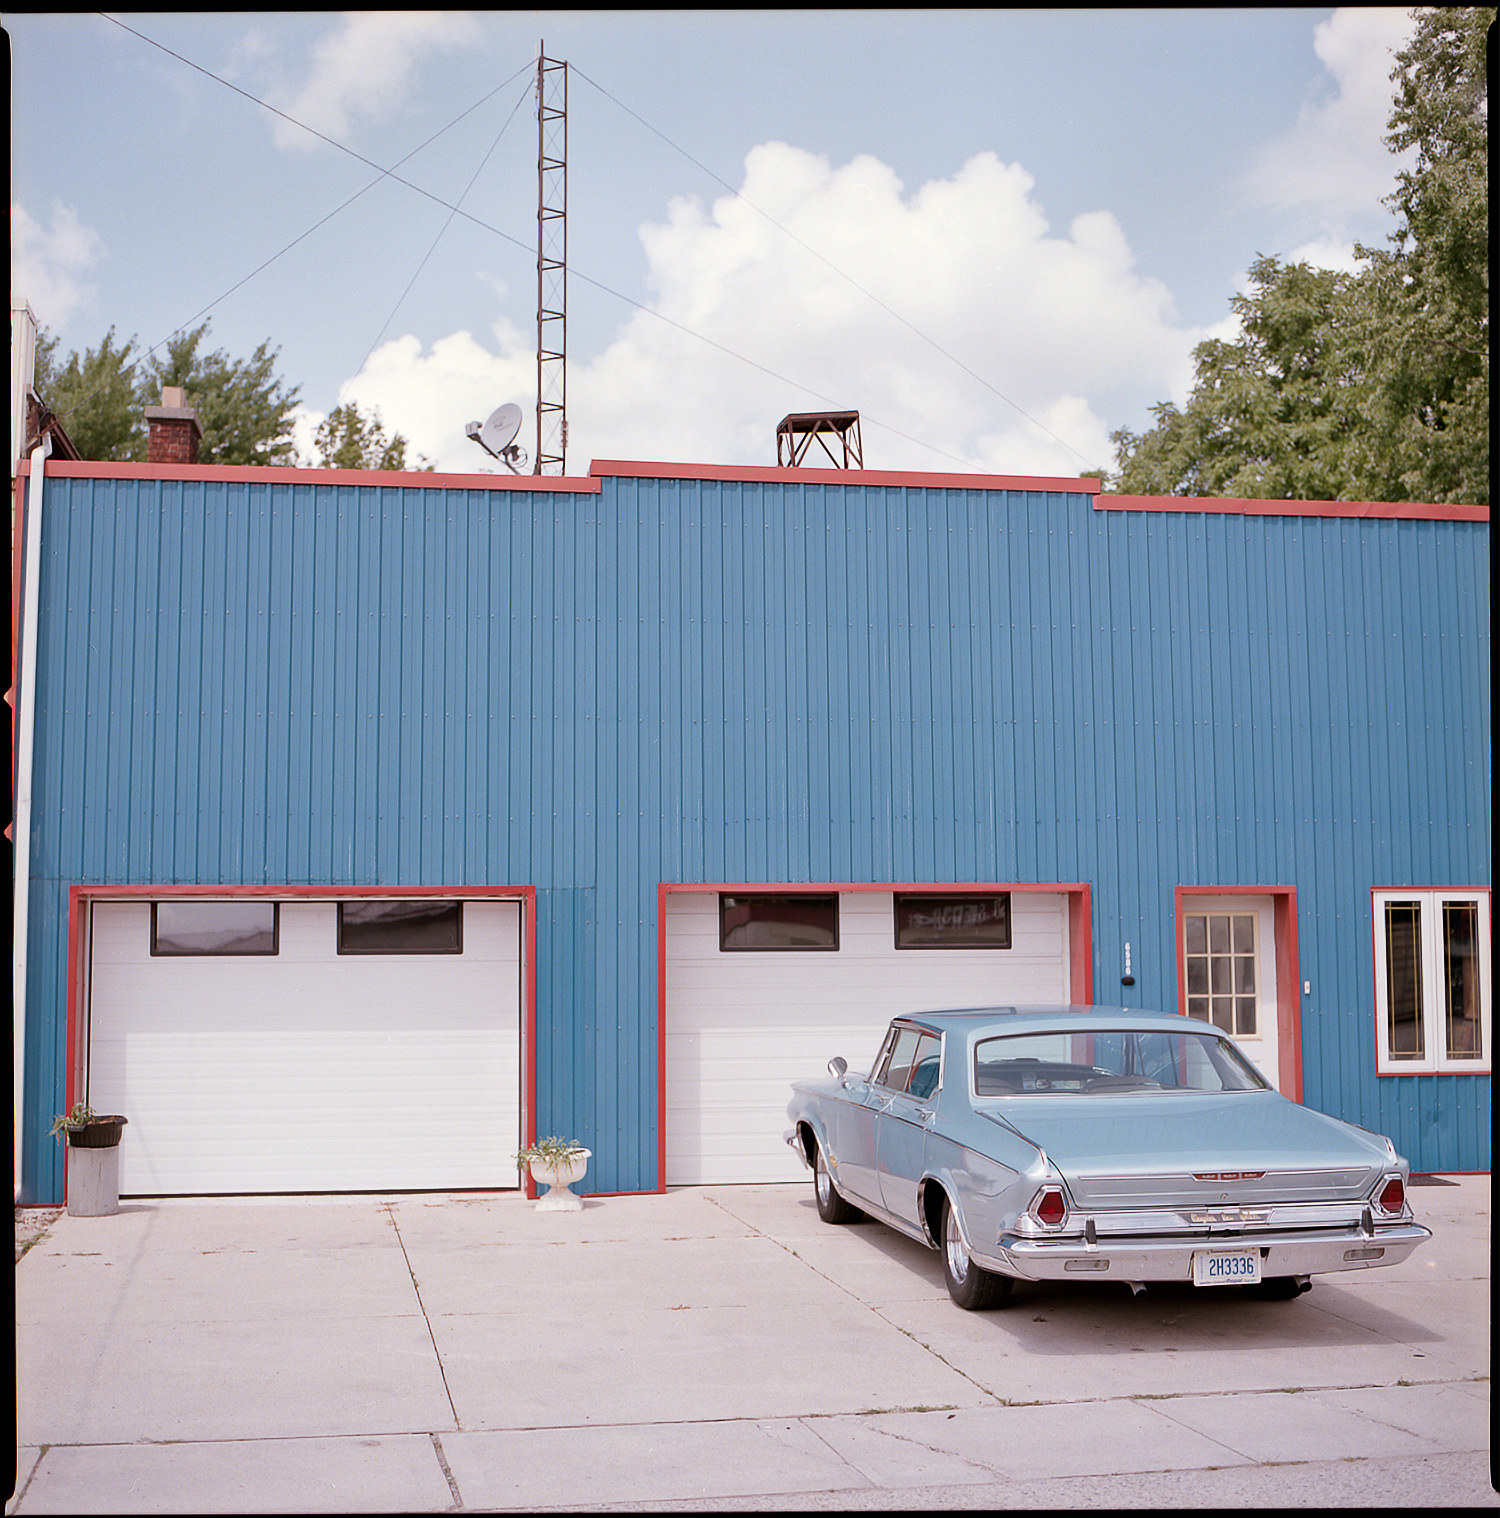 Kodak-Portra-160-Hasselblad-501CM-6x6-Chatam-Ontario-Vintage-Car-Blue-Palette-Hues.jpg